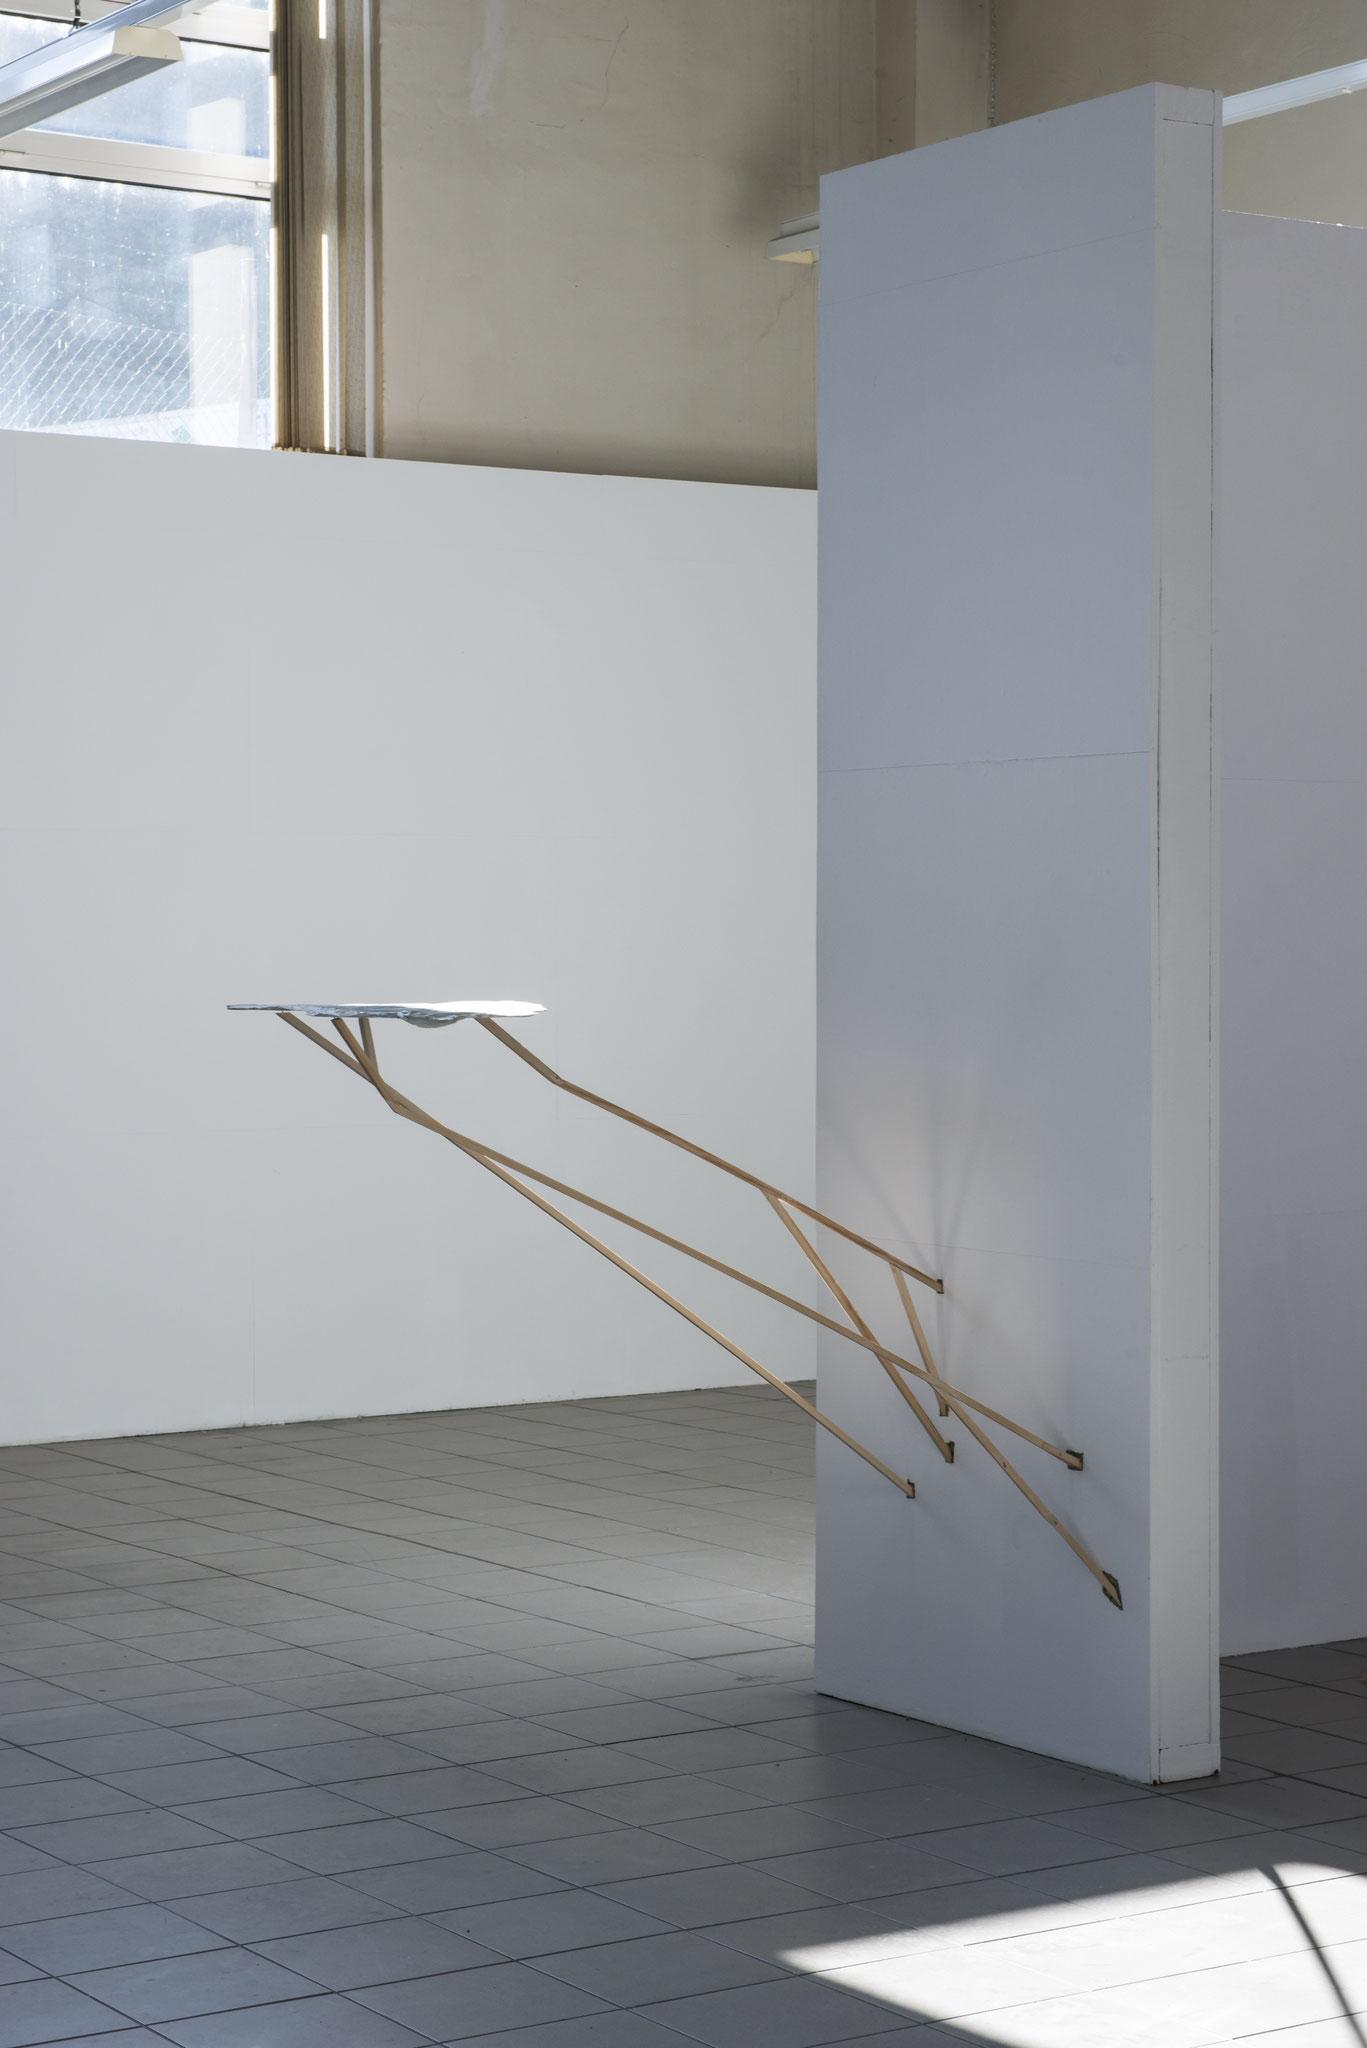 servieren_Zement, Gewebe, Holz_120 x 56 x 130 cm_2018_Foto: Gabi Rottes